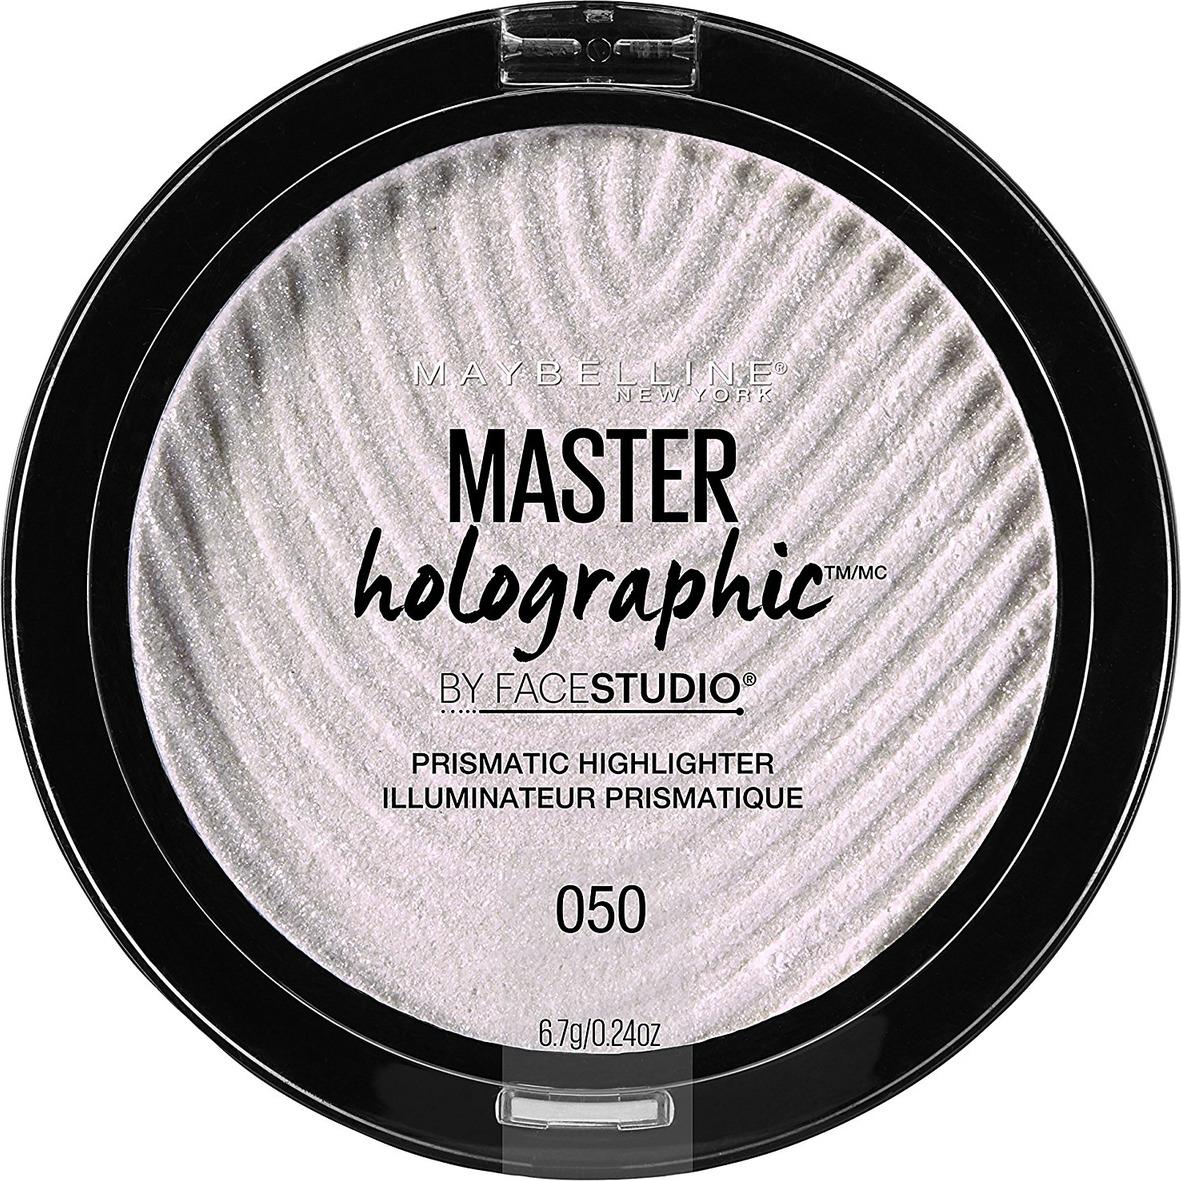 Maybelline New York Хайлайтер для лица Master Holographic Prismatic, для сияния кожи, оттенок Универсальный, 6,7 г maybelline master holographic